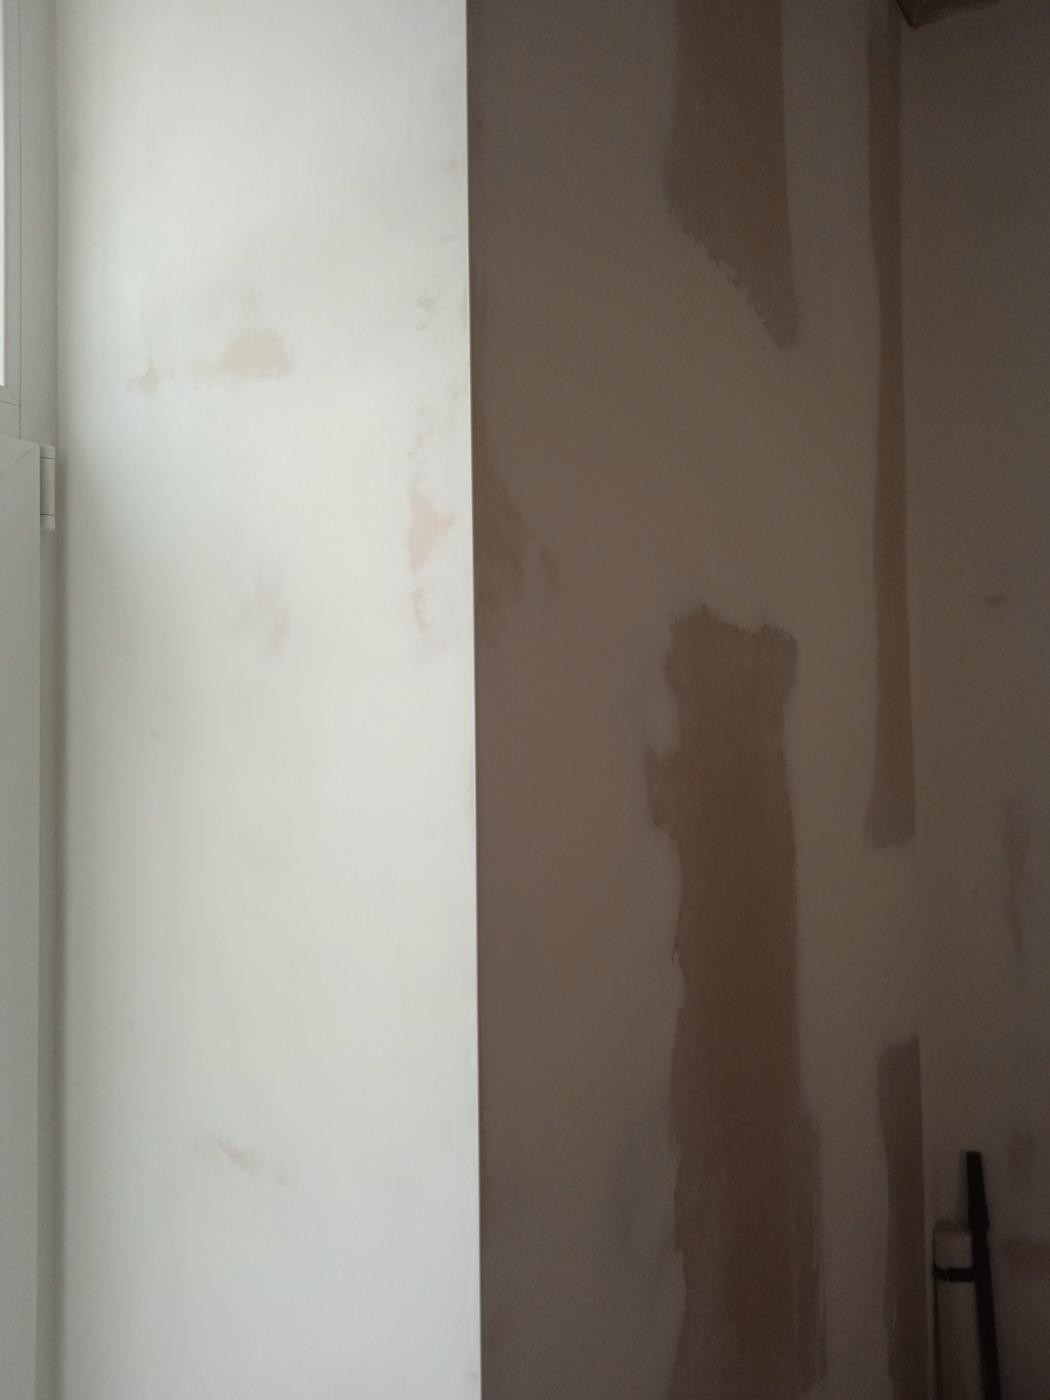 Установка и отделка окон, откосов. Стены